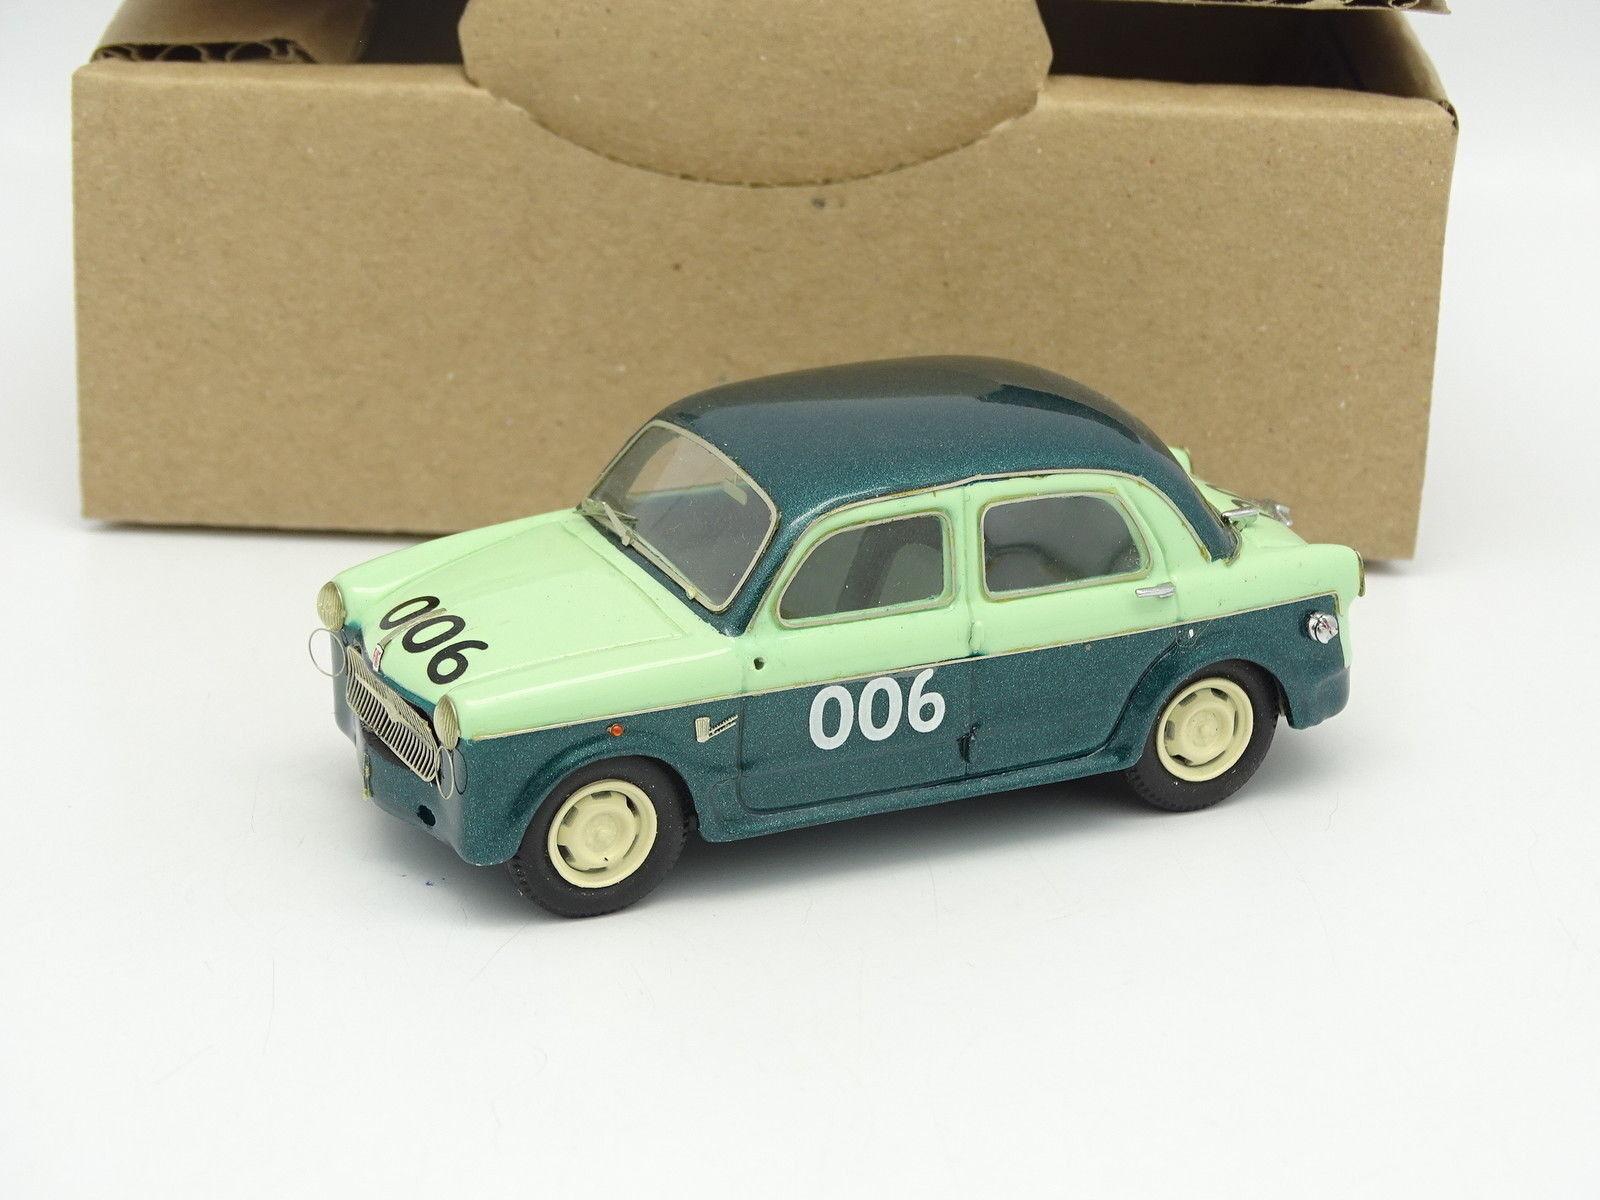 Förlaga IV Factory Kit Mont 65533;65533; SB 1  43 Fiat 1100 MILLE MIGLIA 1957 N 006 WINER